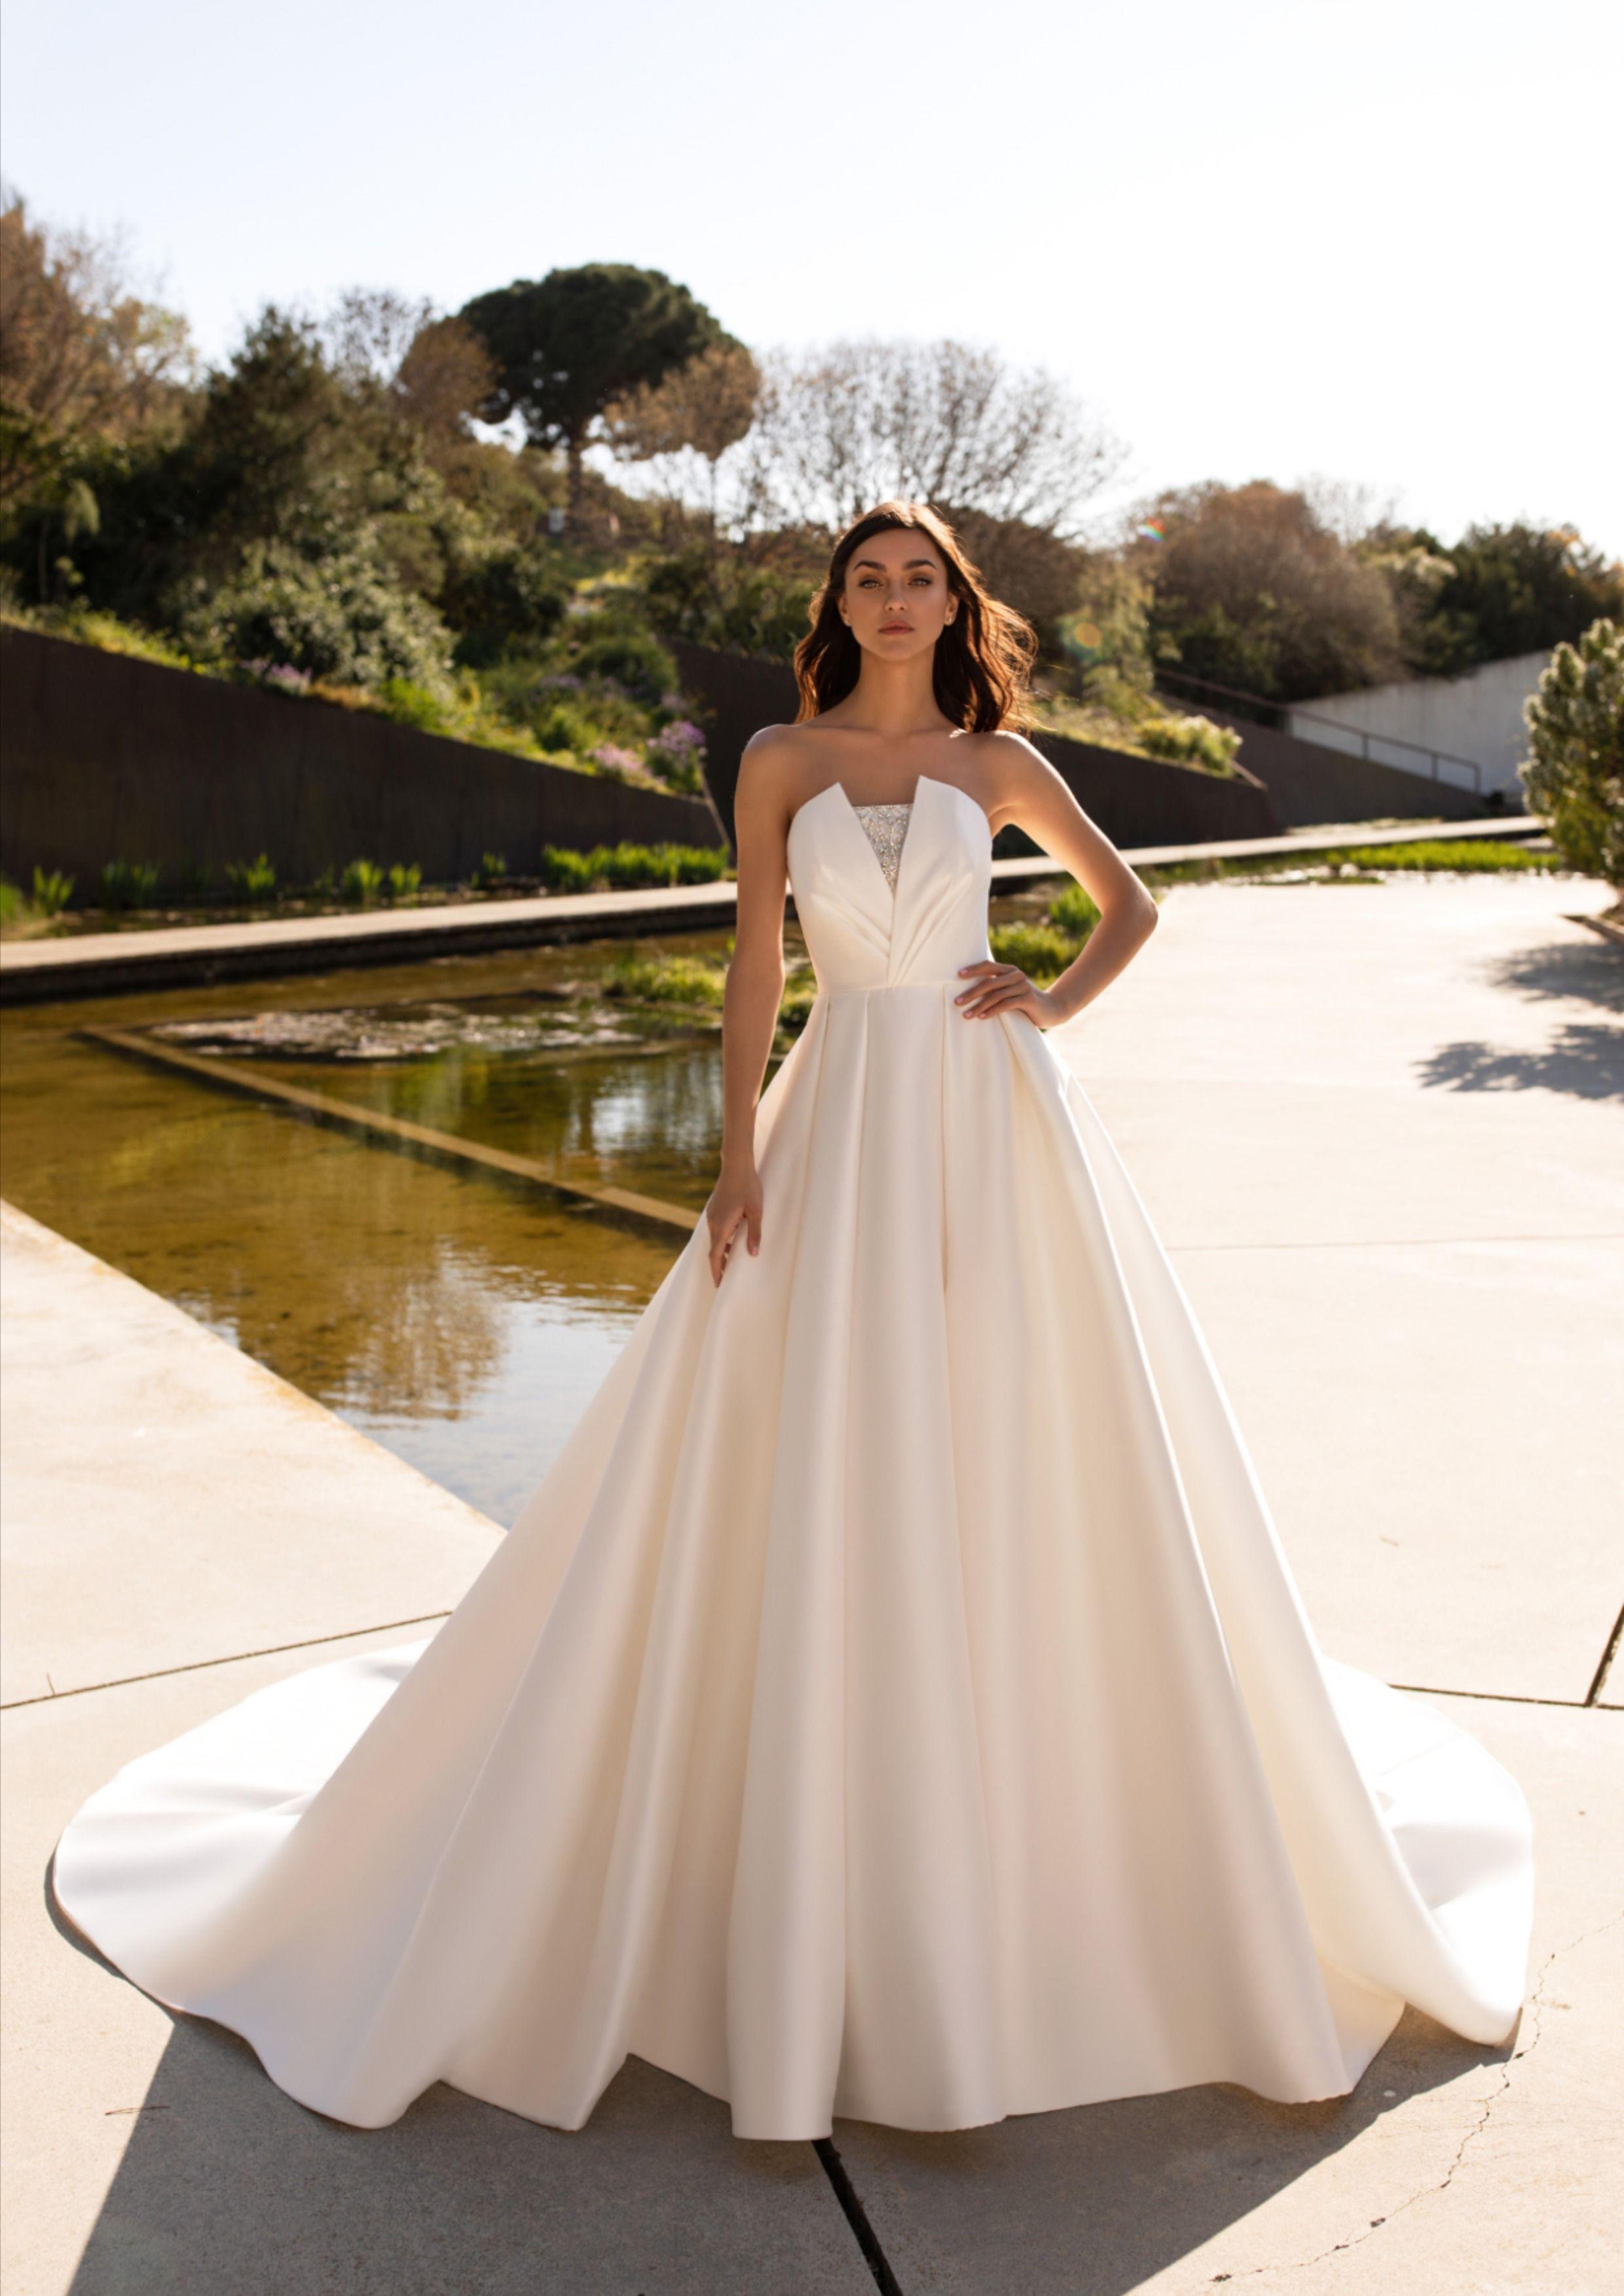 Phoebe Princess Wedding Dress European Wedding Dresses Princess Wedding Dresses Wedding Dresses [ 3507 x 2480 Pixel ]